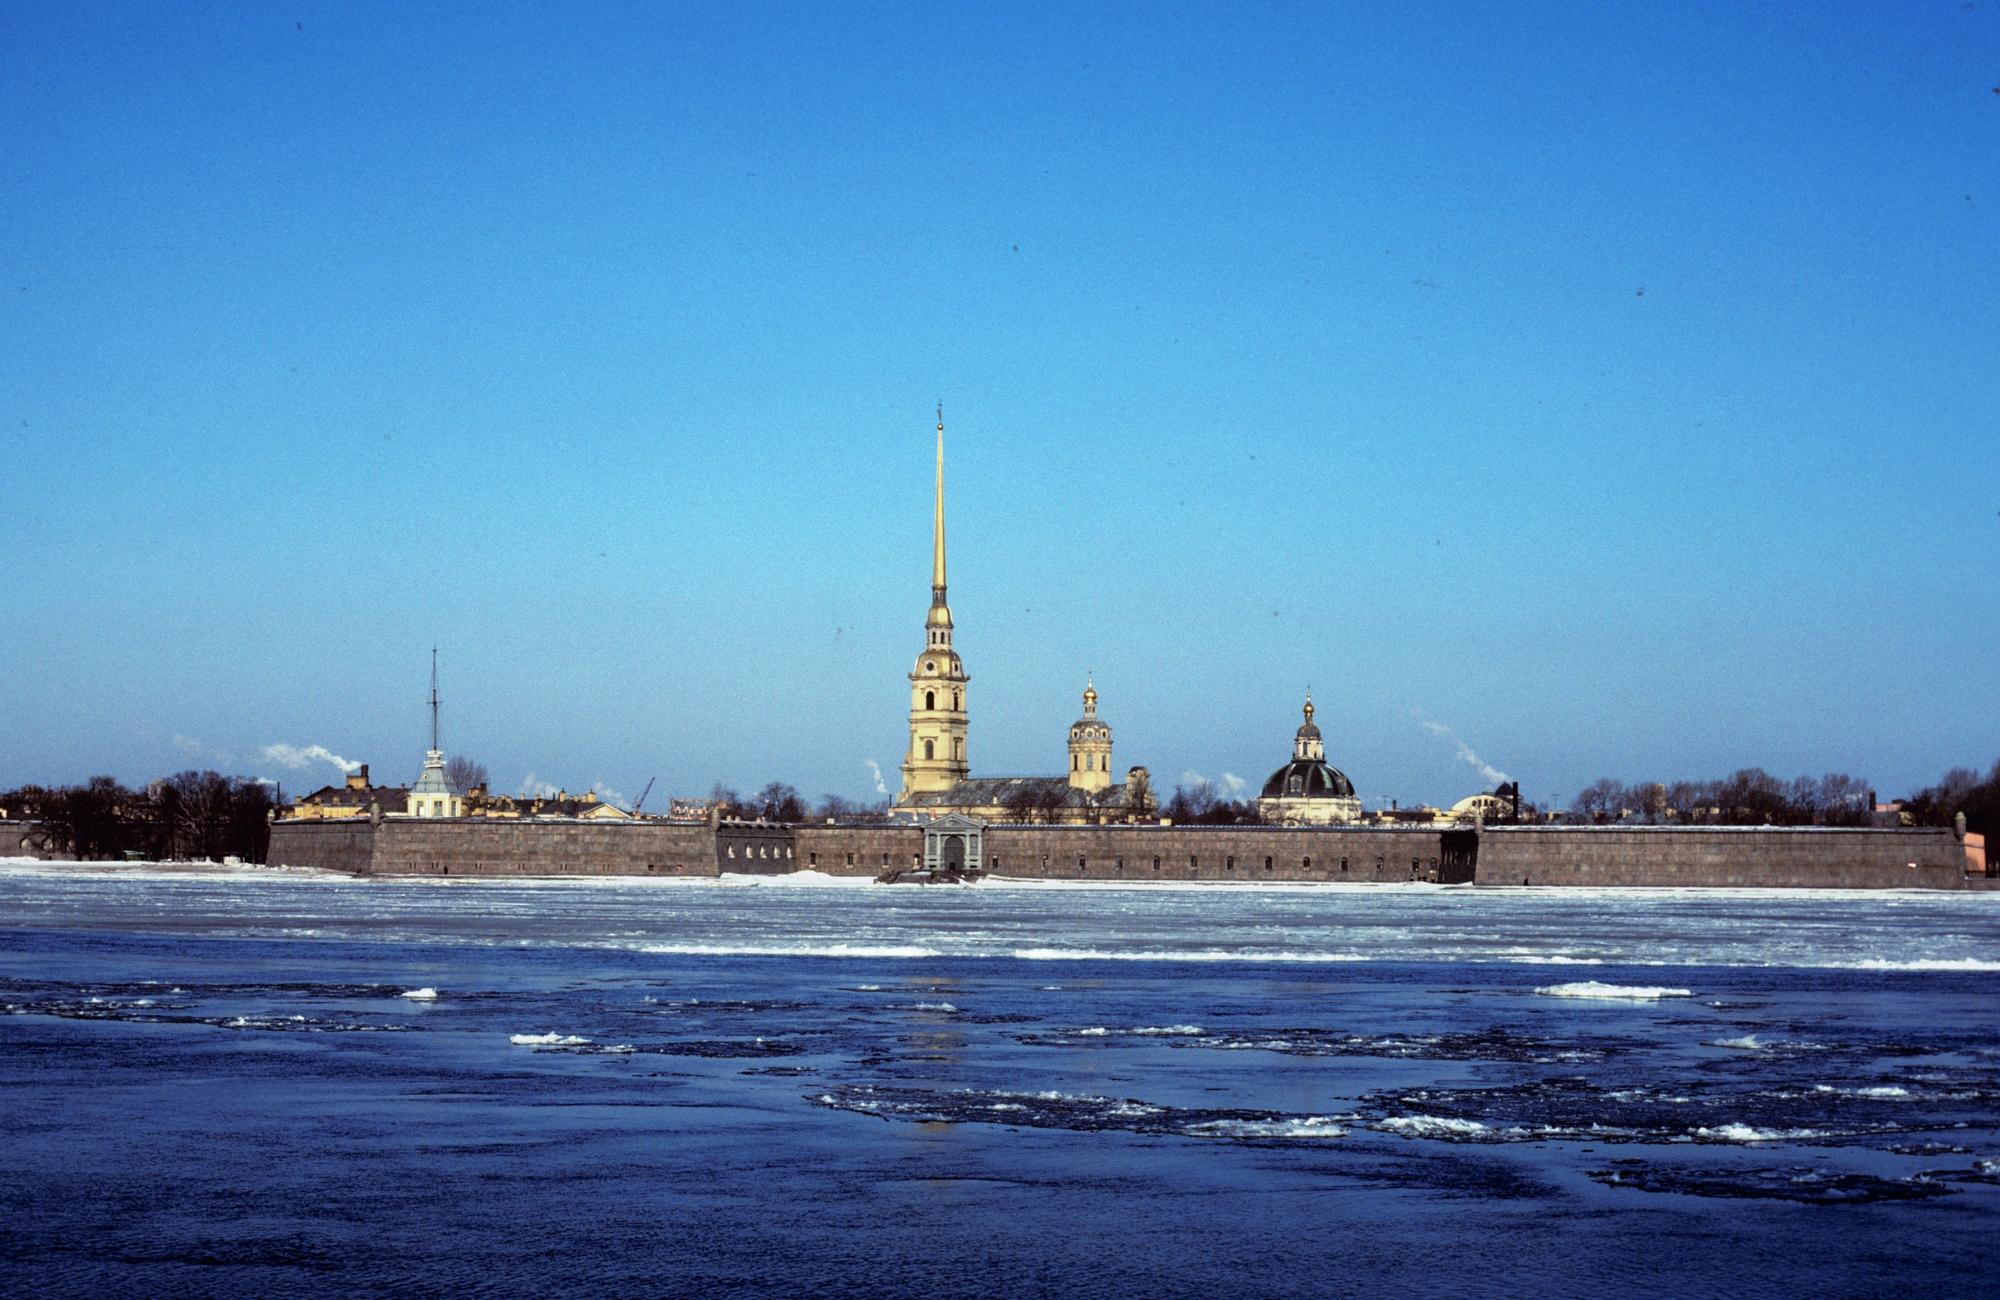 Ms2020_001_BurtonDoug_B1_F8_2_1979_Soviet_Union_009.jpg